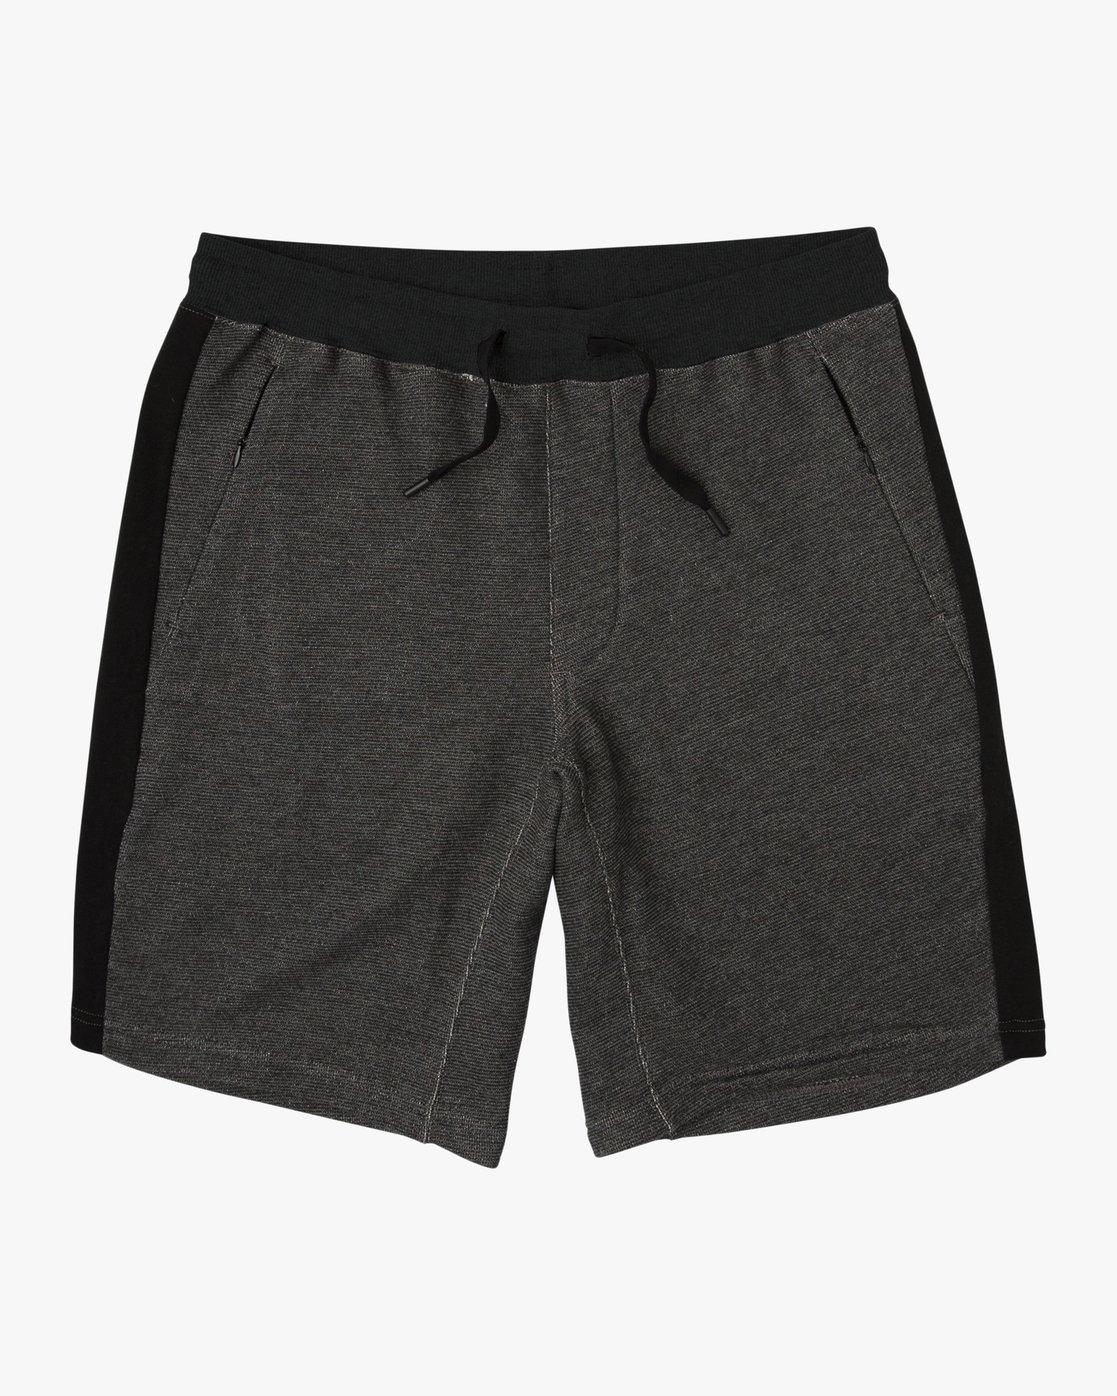 0 Premium Sweat Short Black M202SRPR RVCA